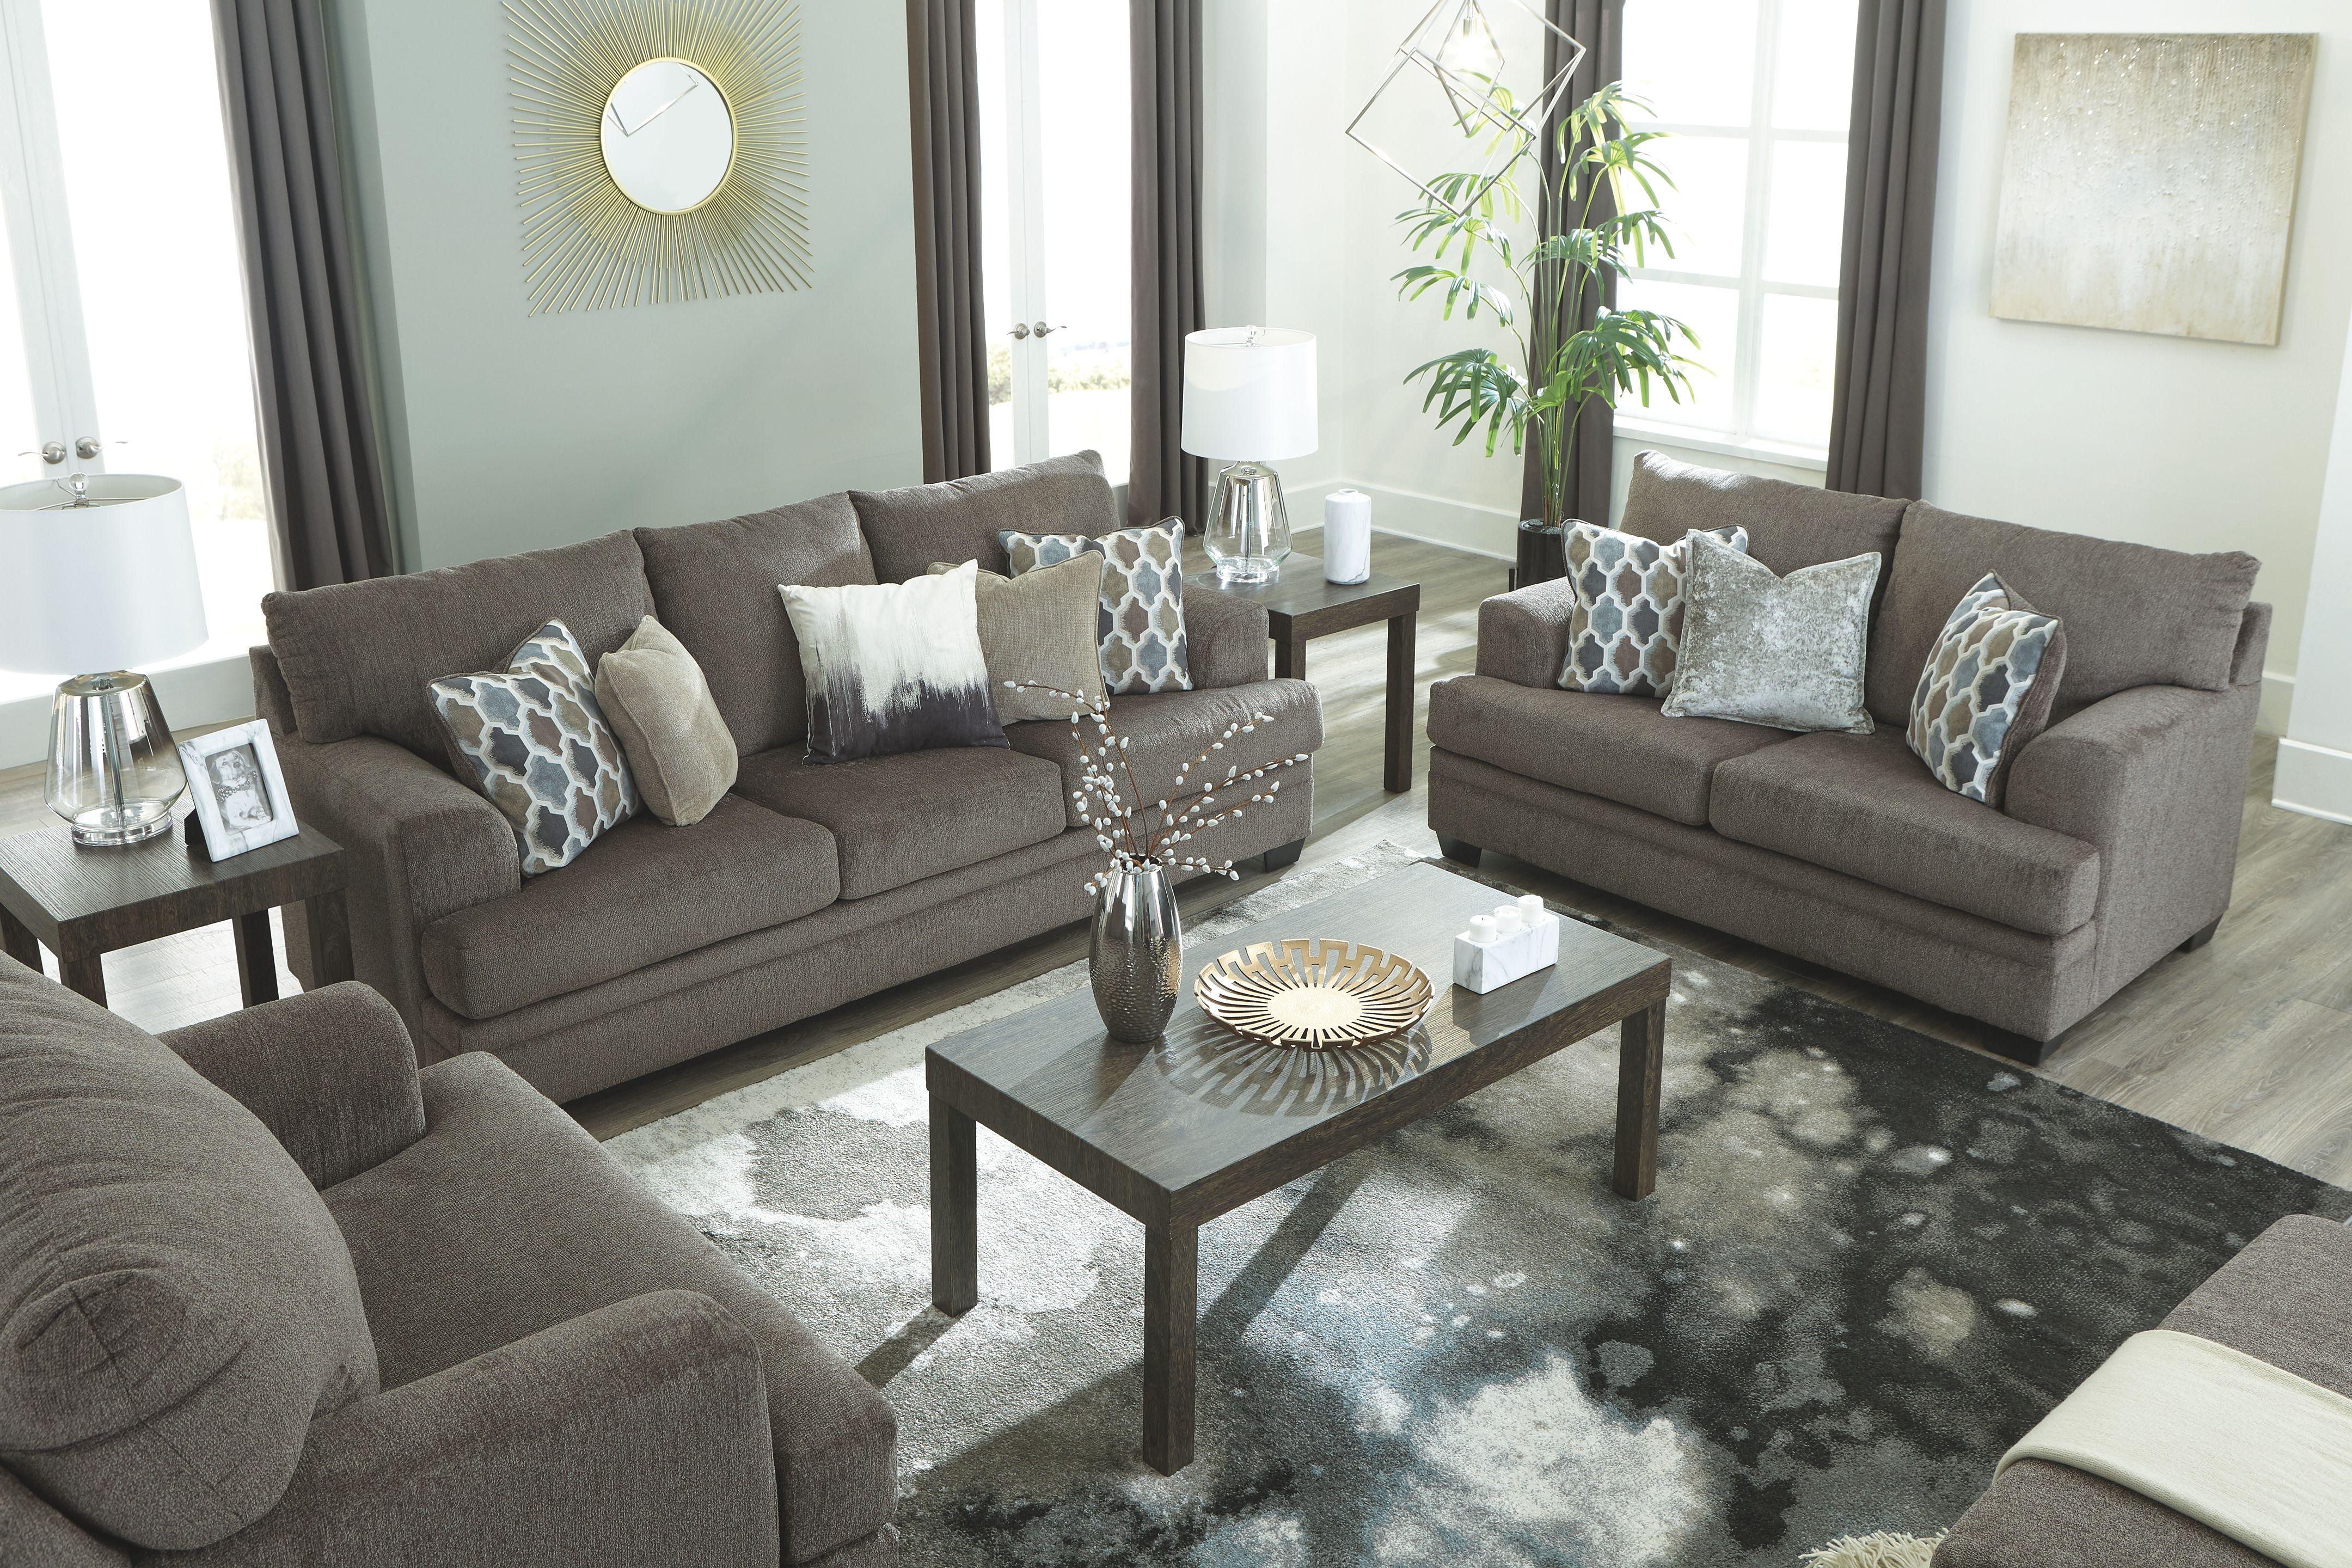 Brilliant Dorsten Queen Sofa Sleeper Slate Products Sofa Unemploymentrelief Wooden Chair Designs For Living Room Unemploymentrelieforg